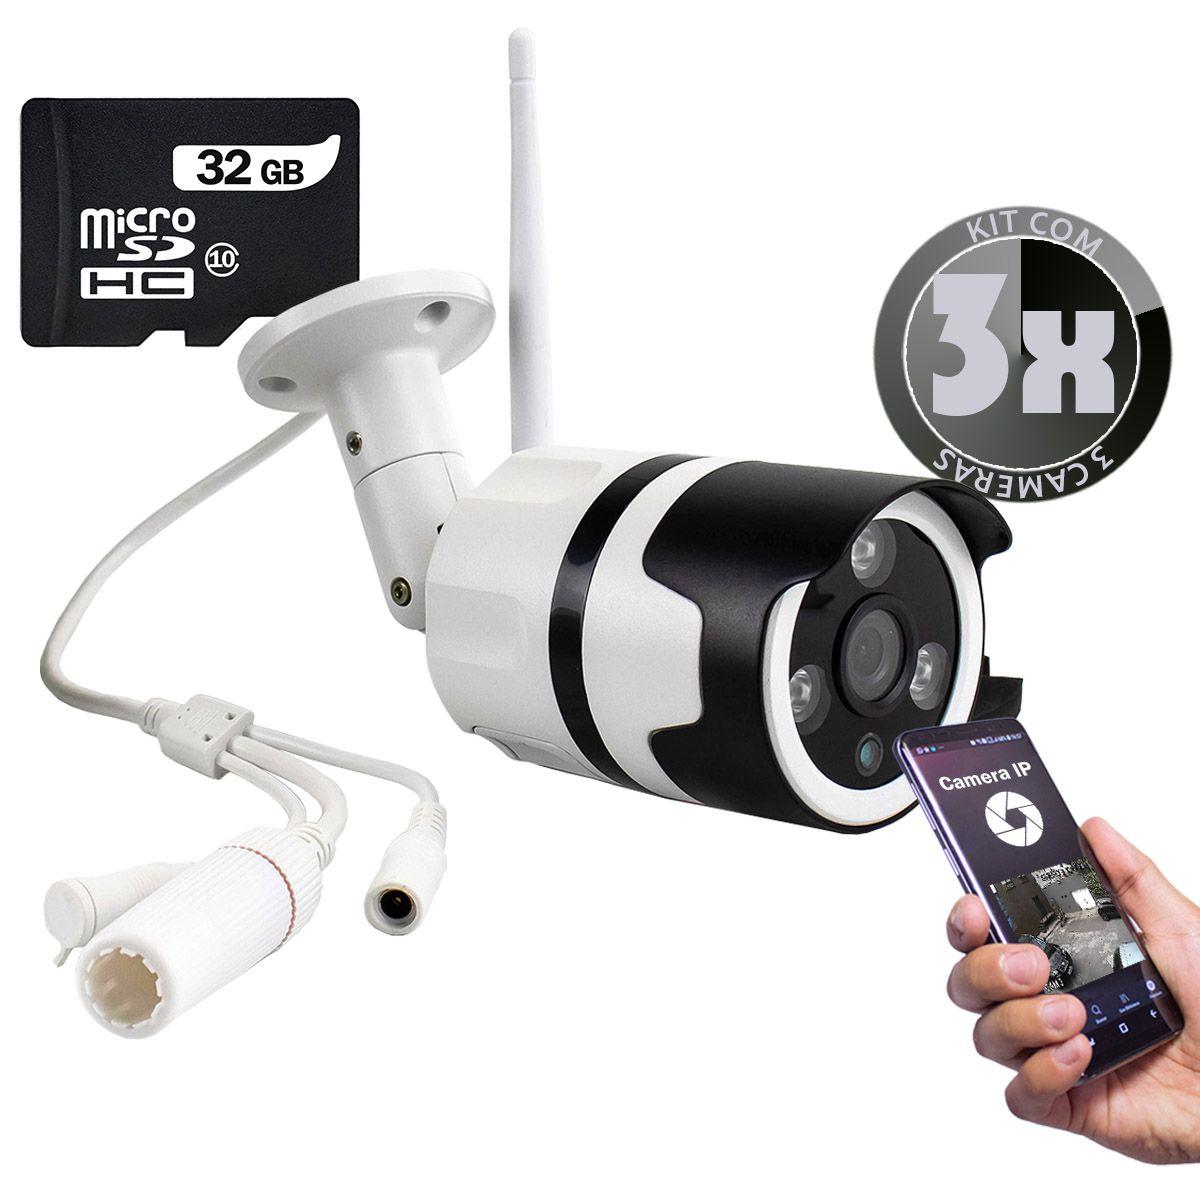 KIT 3x Câmera IP Digital Externa Full HD à Prova D'água com Visão Noturna 1080p XA-N632 + 3x Cartão Micro SD 32GB